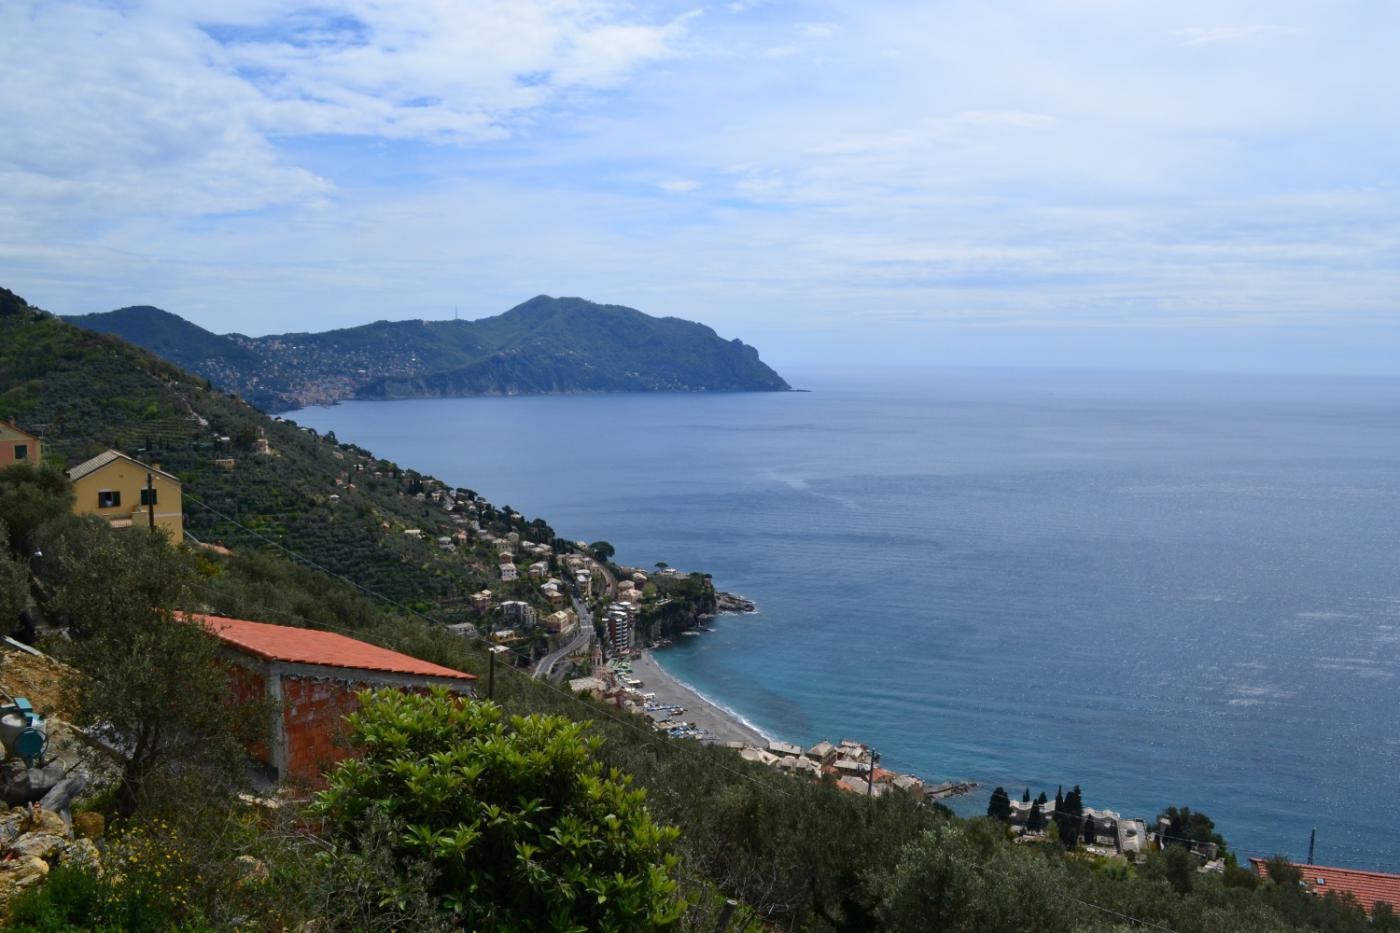 panorama verso Sant'Apollinare